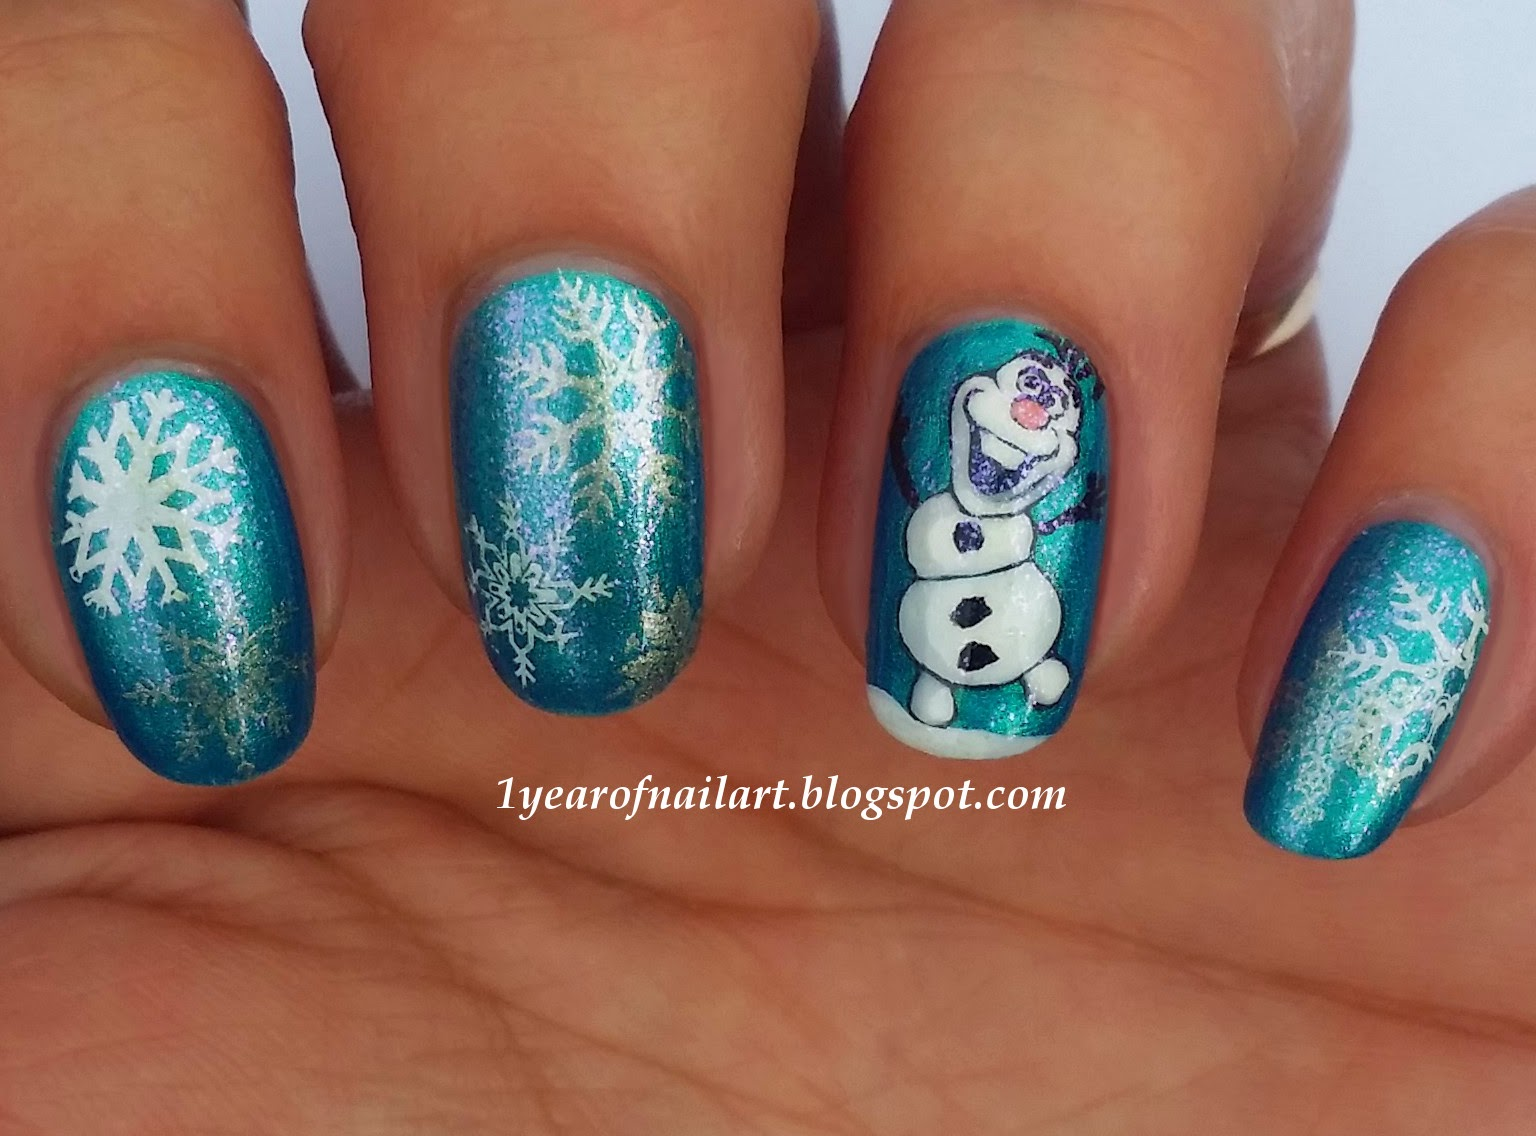 365+ days of nail art: Disney Frozen Olaf nail art